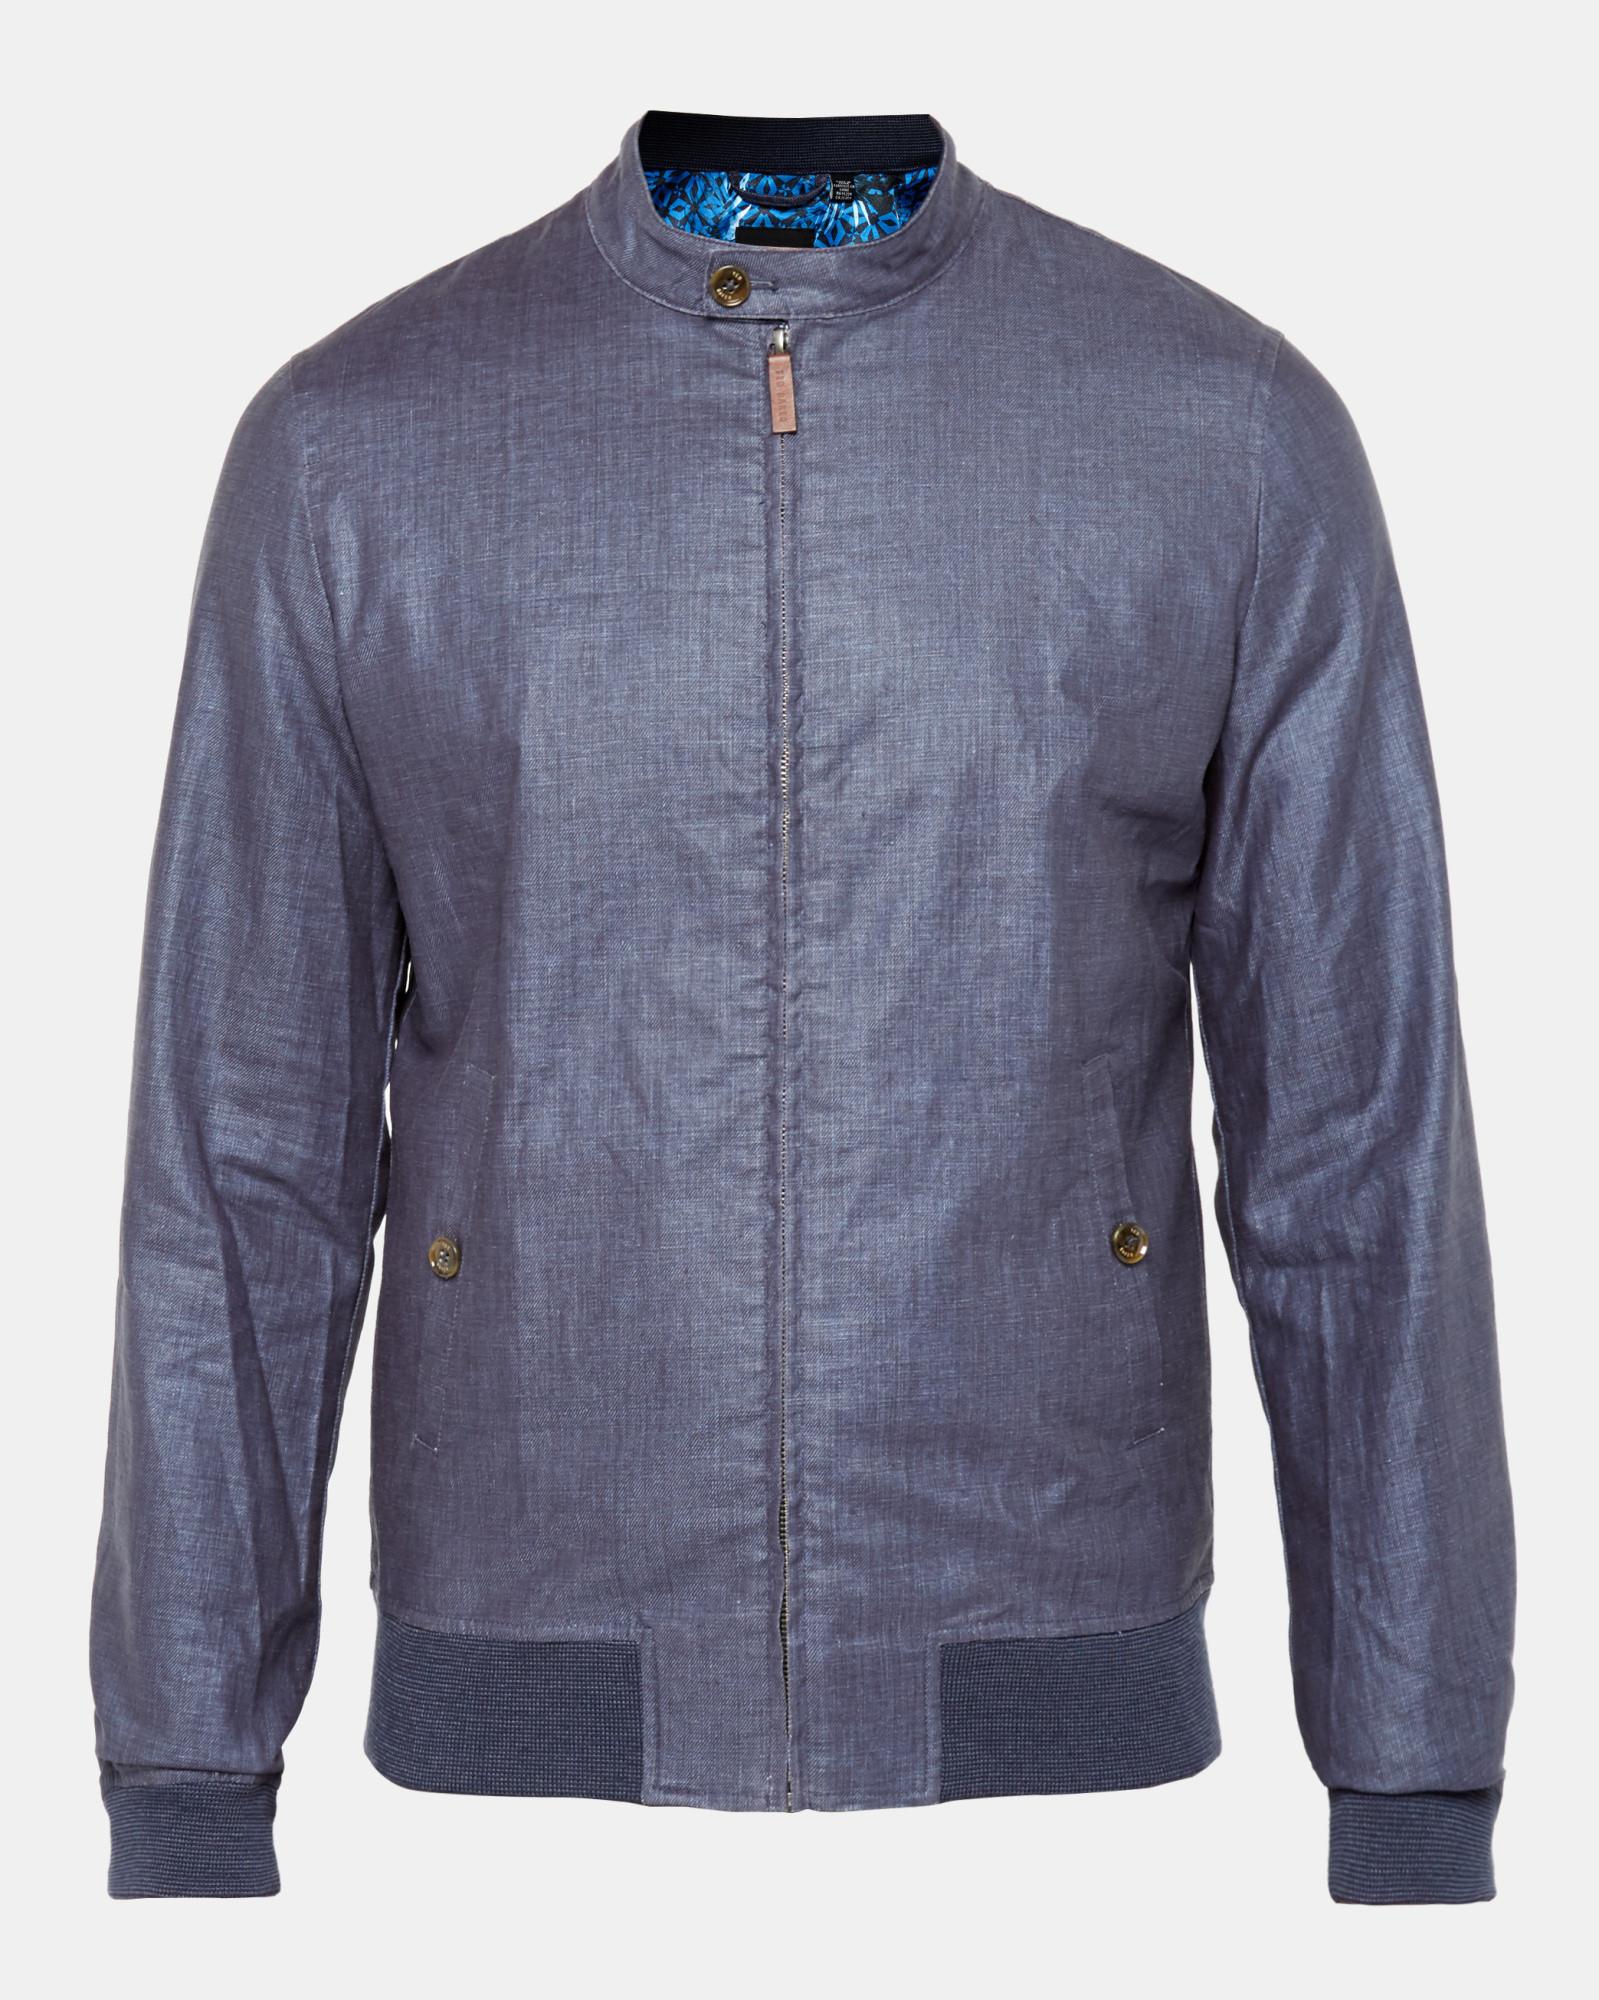 8f5834b04f3170 Lyst - Ted Baker Coated Linen Bomber Jacket in Blue for Men